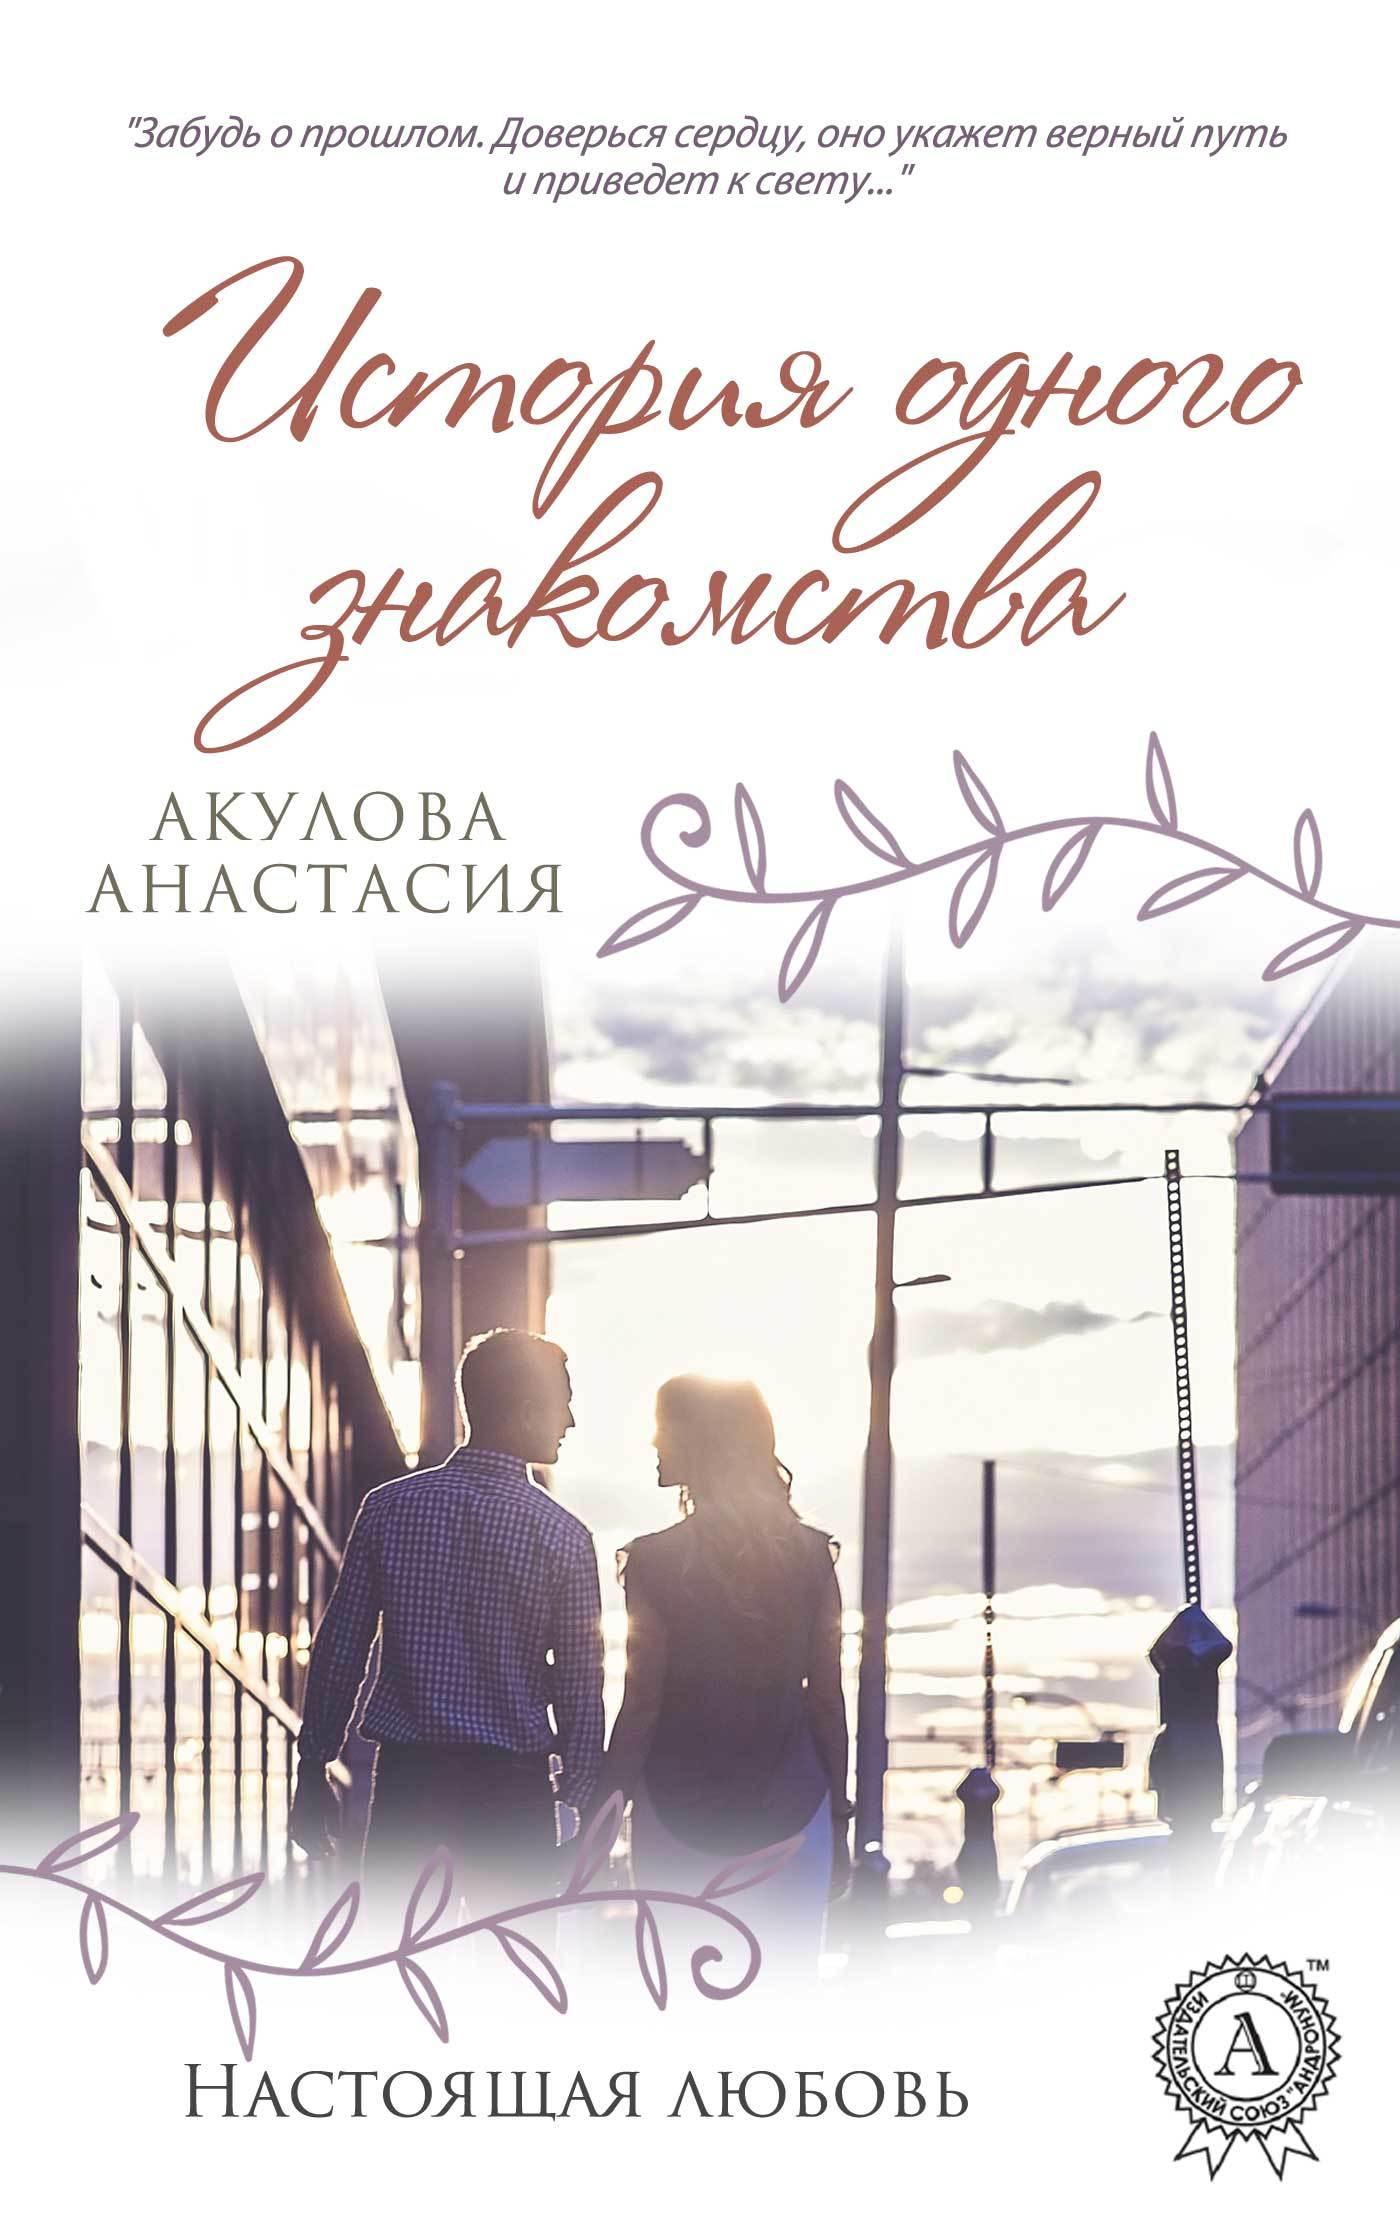 Анастасия Акулова История одного знакомства анастасия акулова кассандра